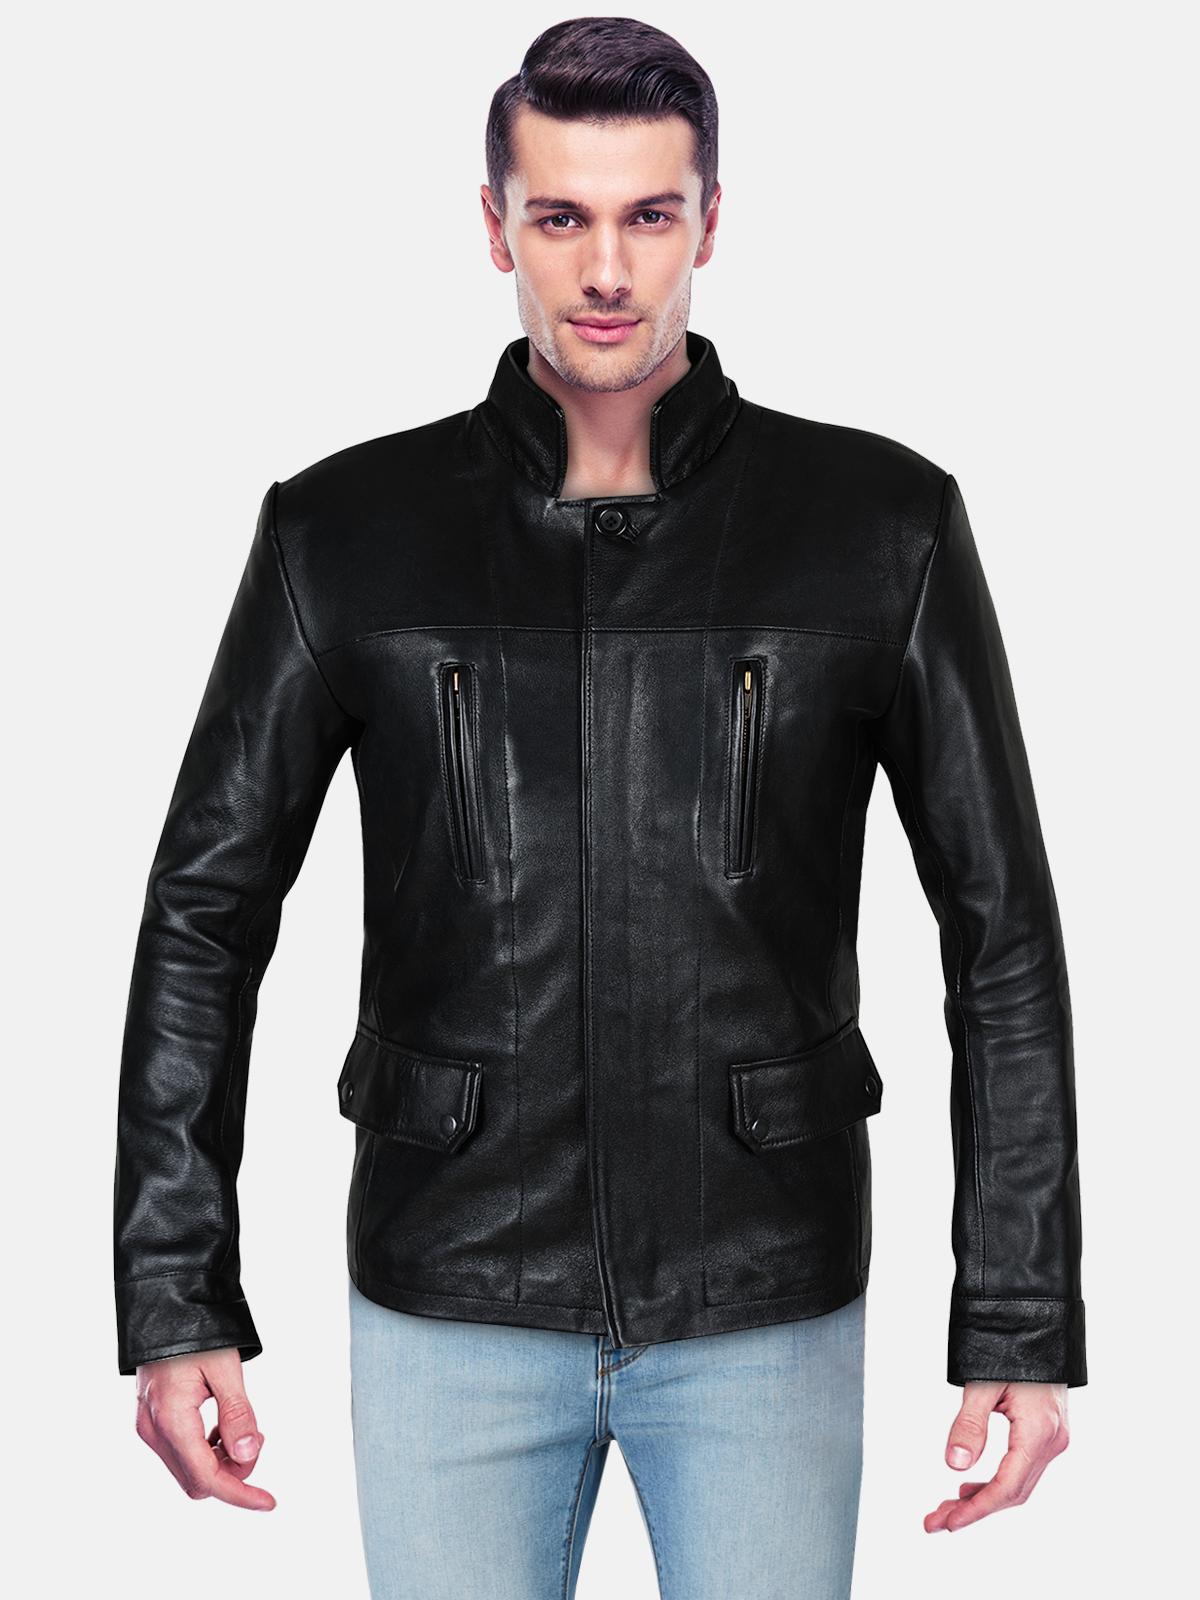 Black Leather Jacket IdealJackets